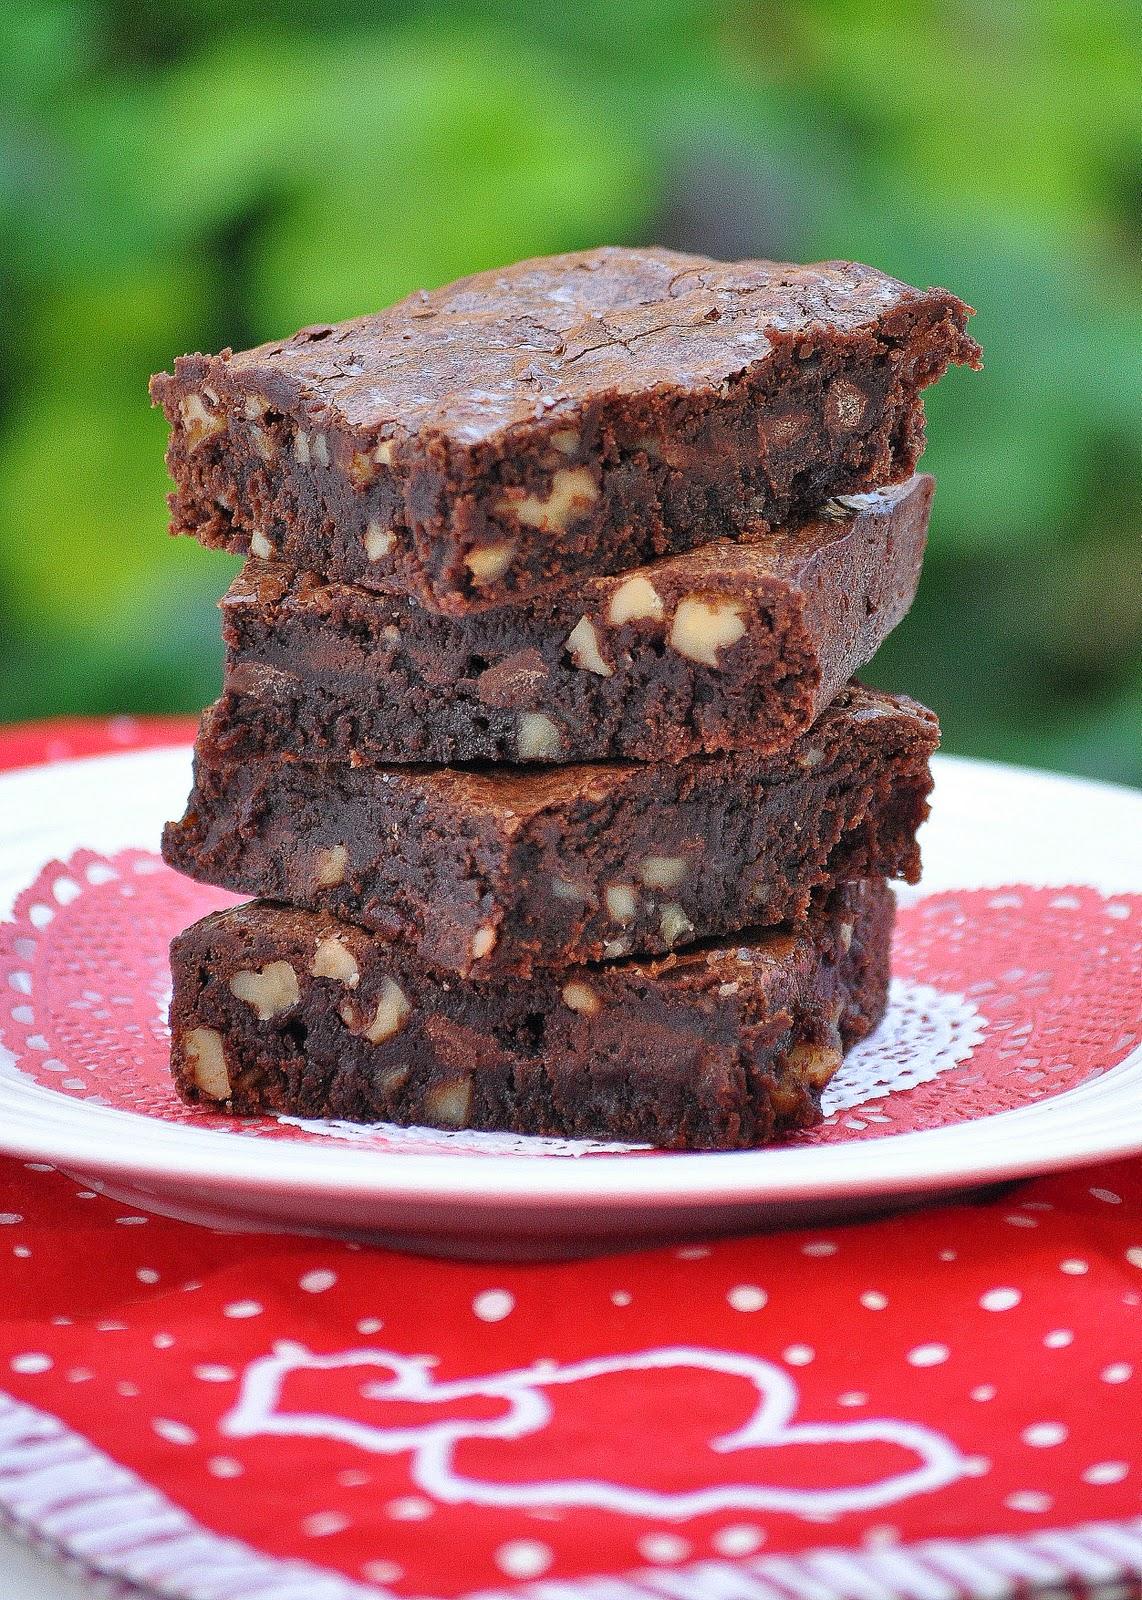 Chocolate Chip Brownies | Lemons and Lavender